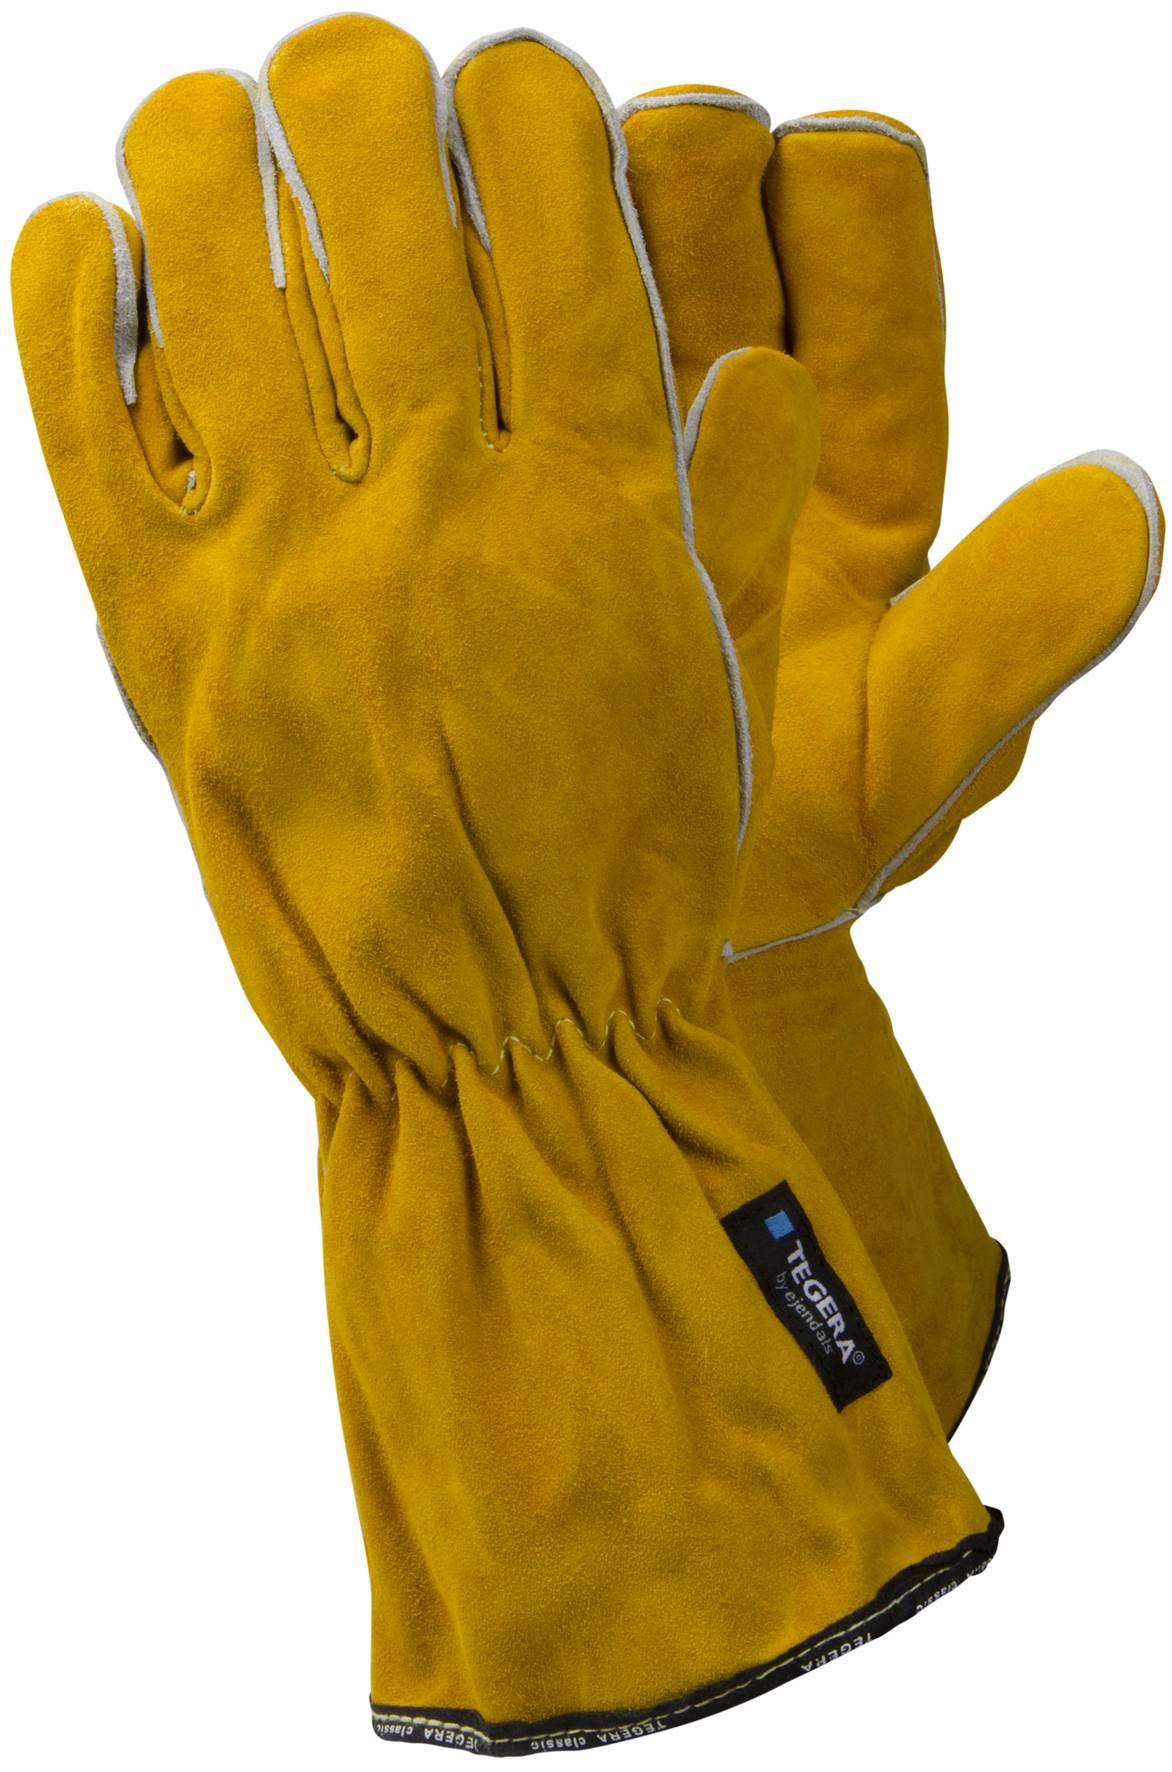 Tegera 19 Heavy Duty Fully Lined Heat Resistant Leather